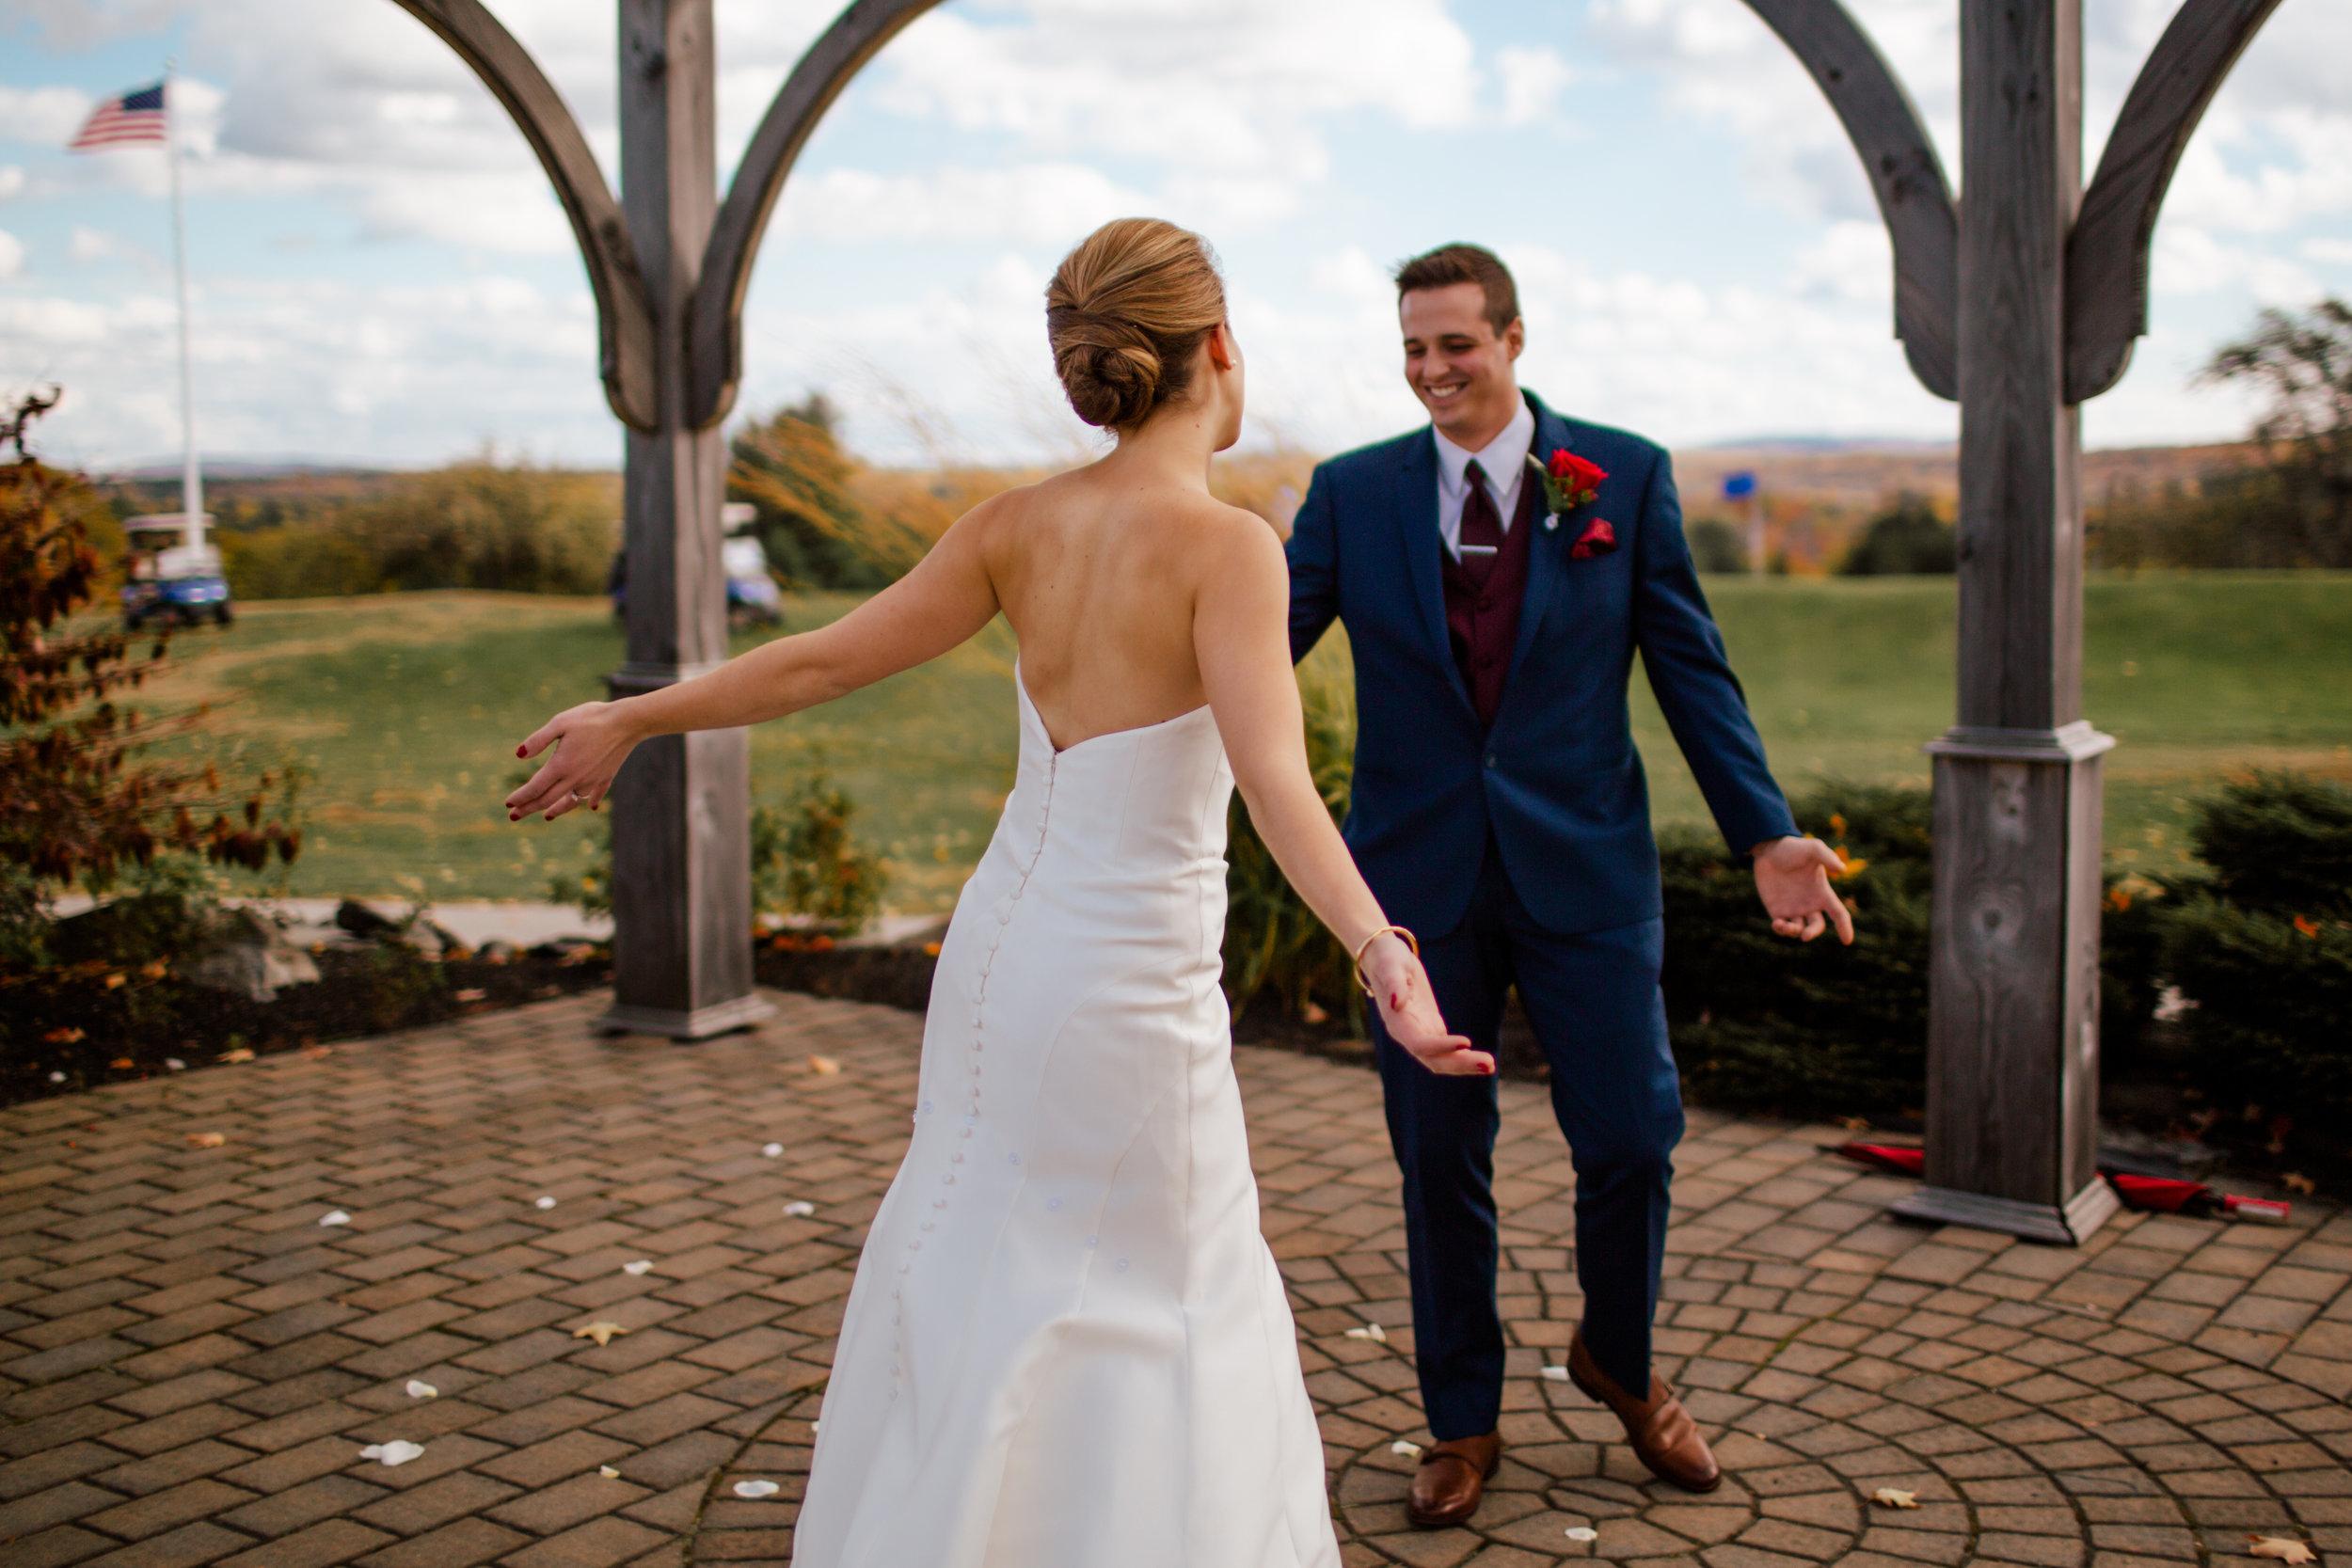 Jeff-and-Leslie-Wedding -0483.jpg